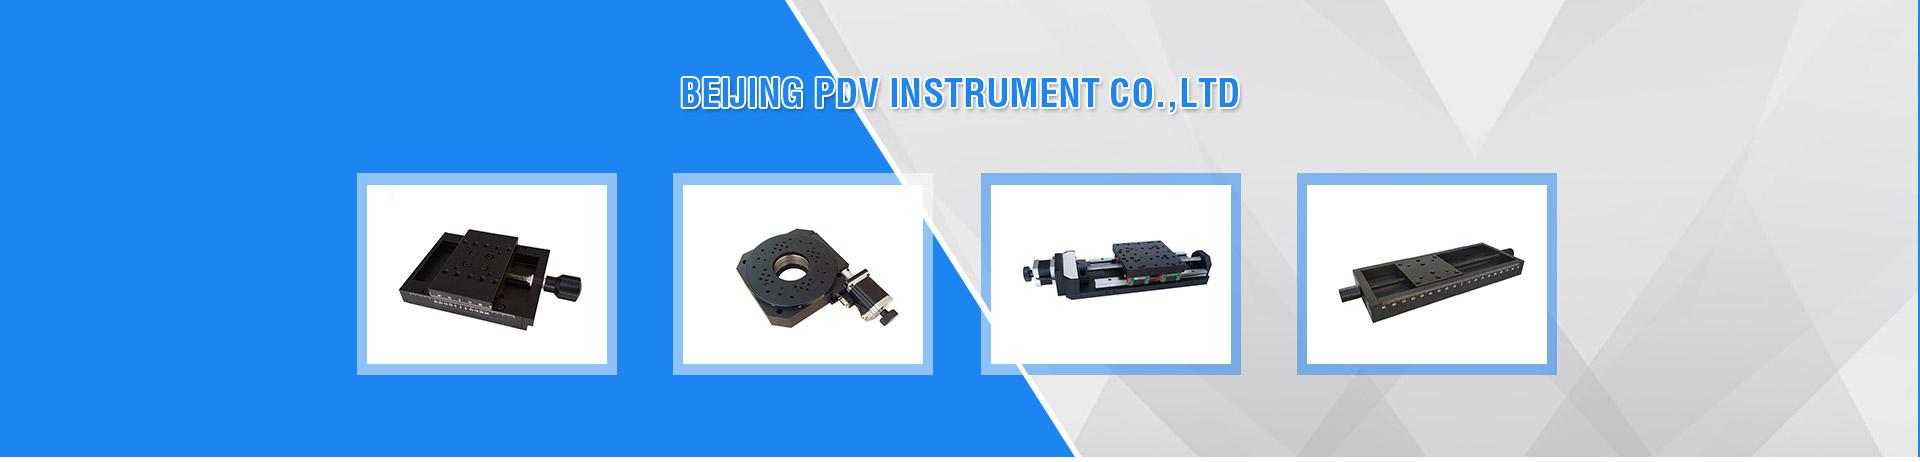 XY Mobile Platform, Manual Translating Stage, Optical Table PT-100